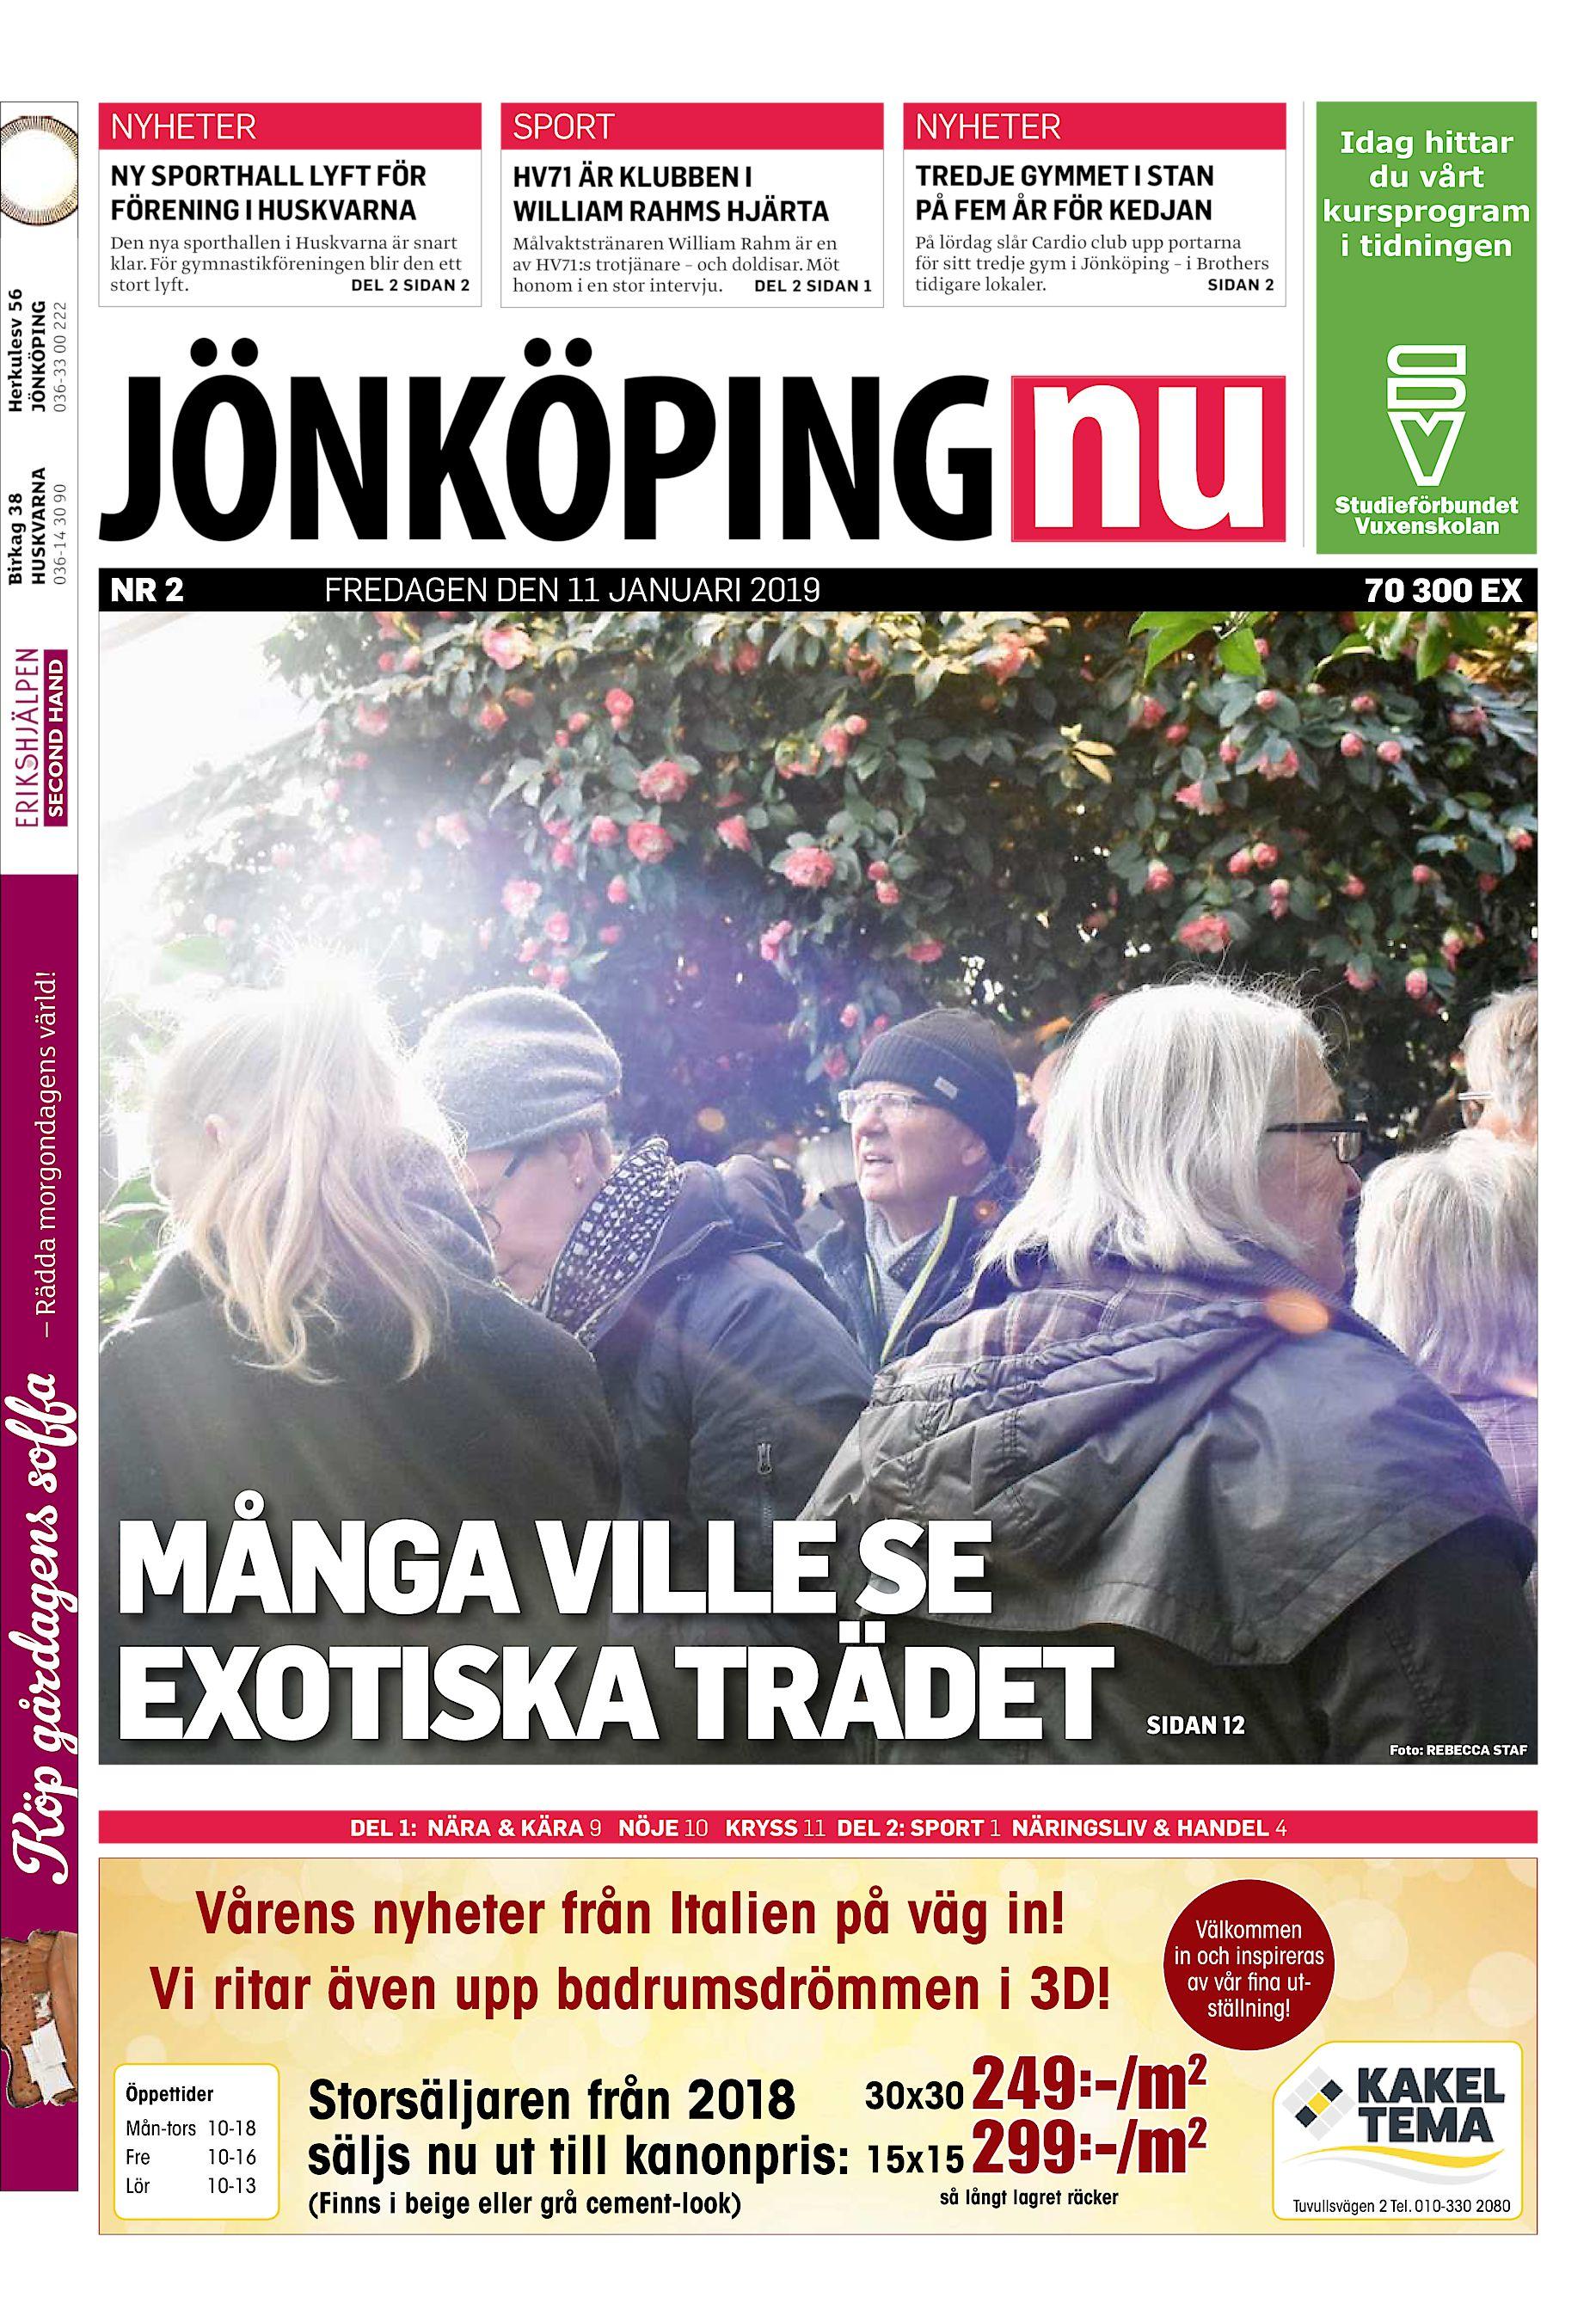 d9c79ba1625d Jönköping.nu JNU-20190111 (endast text)